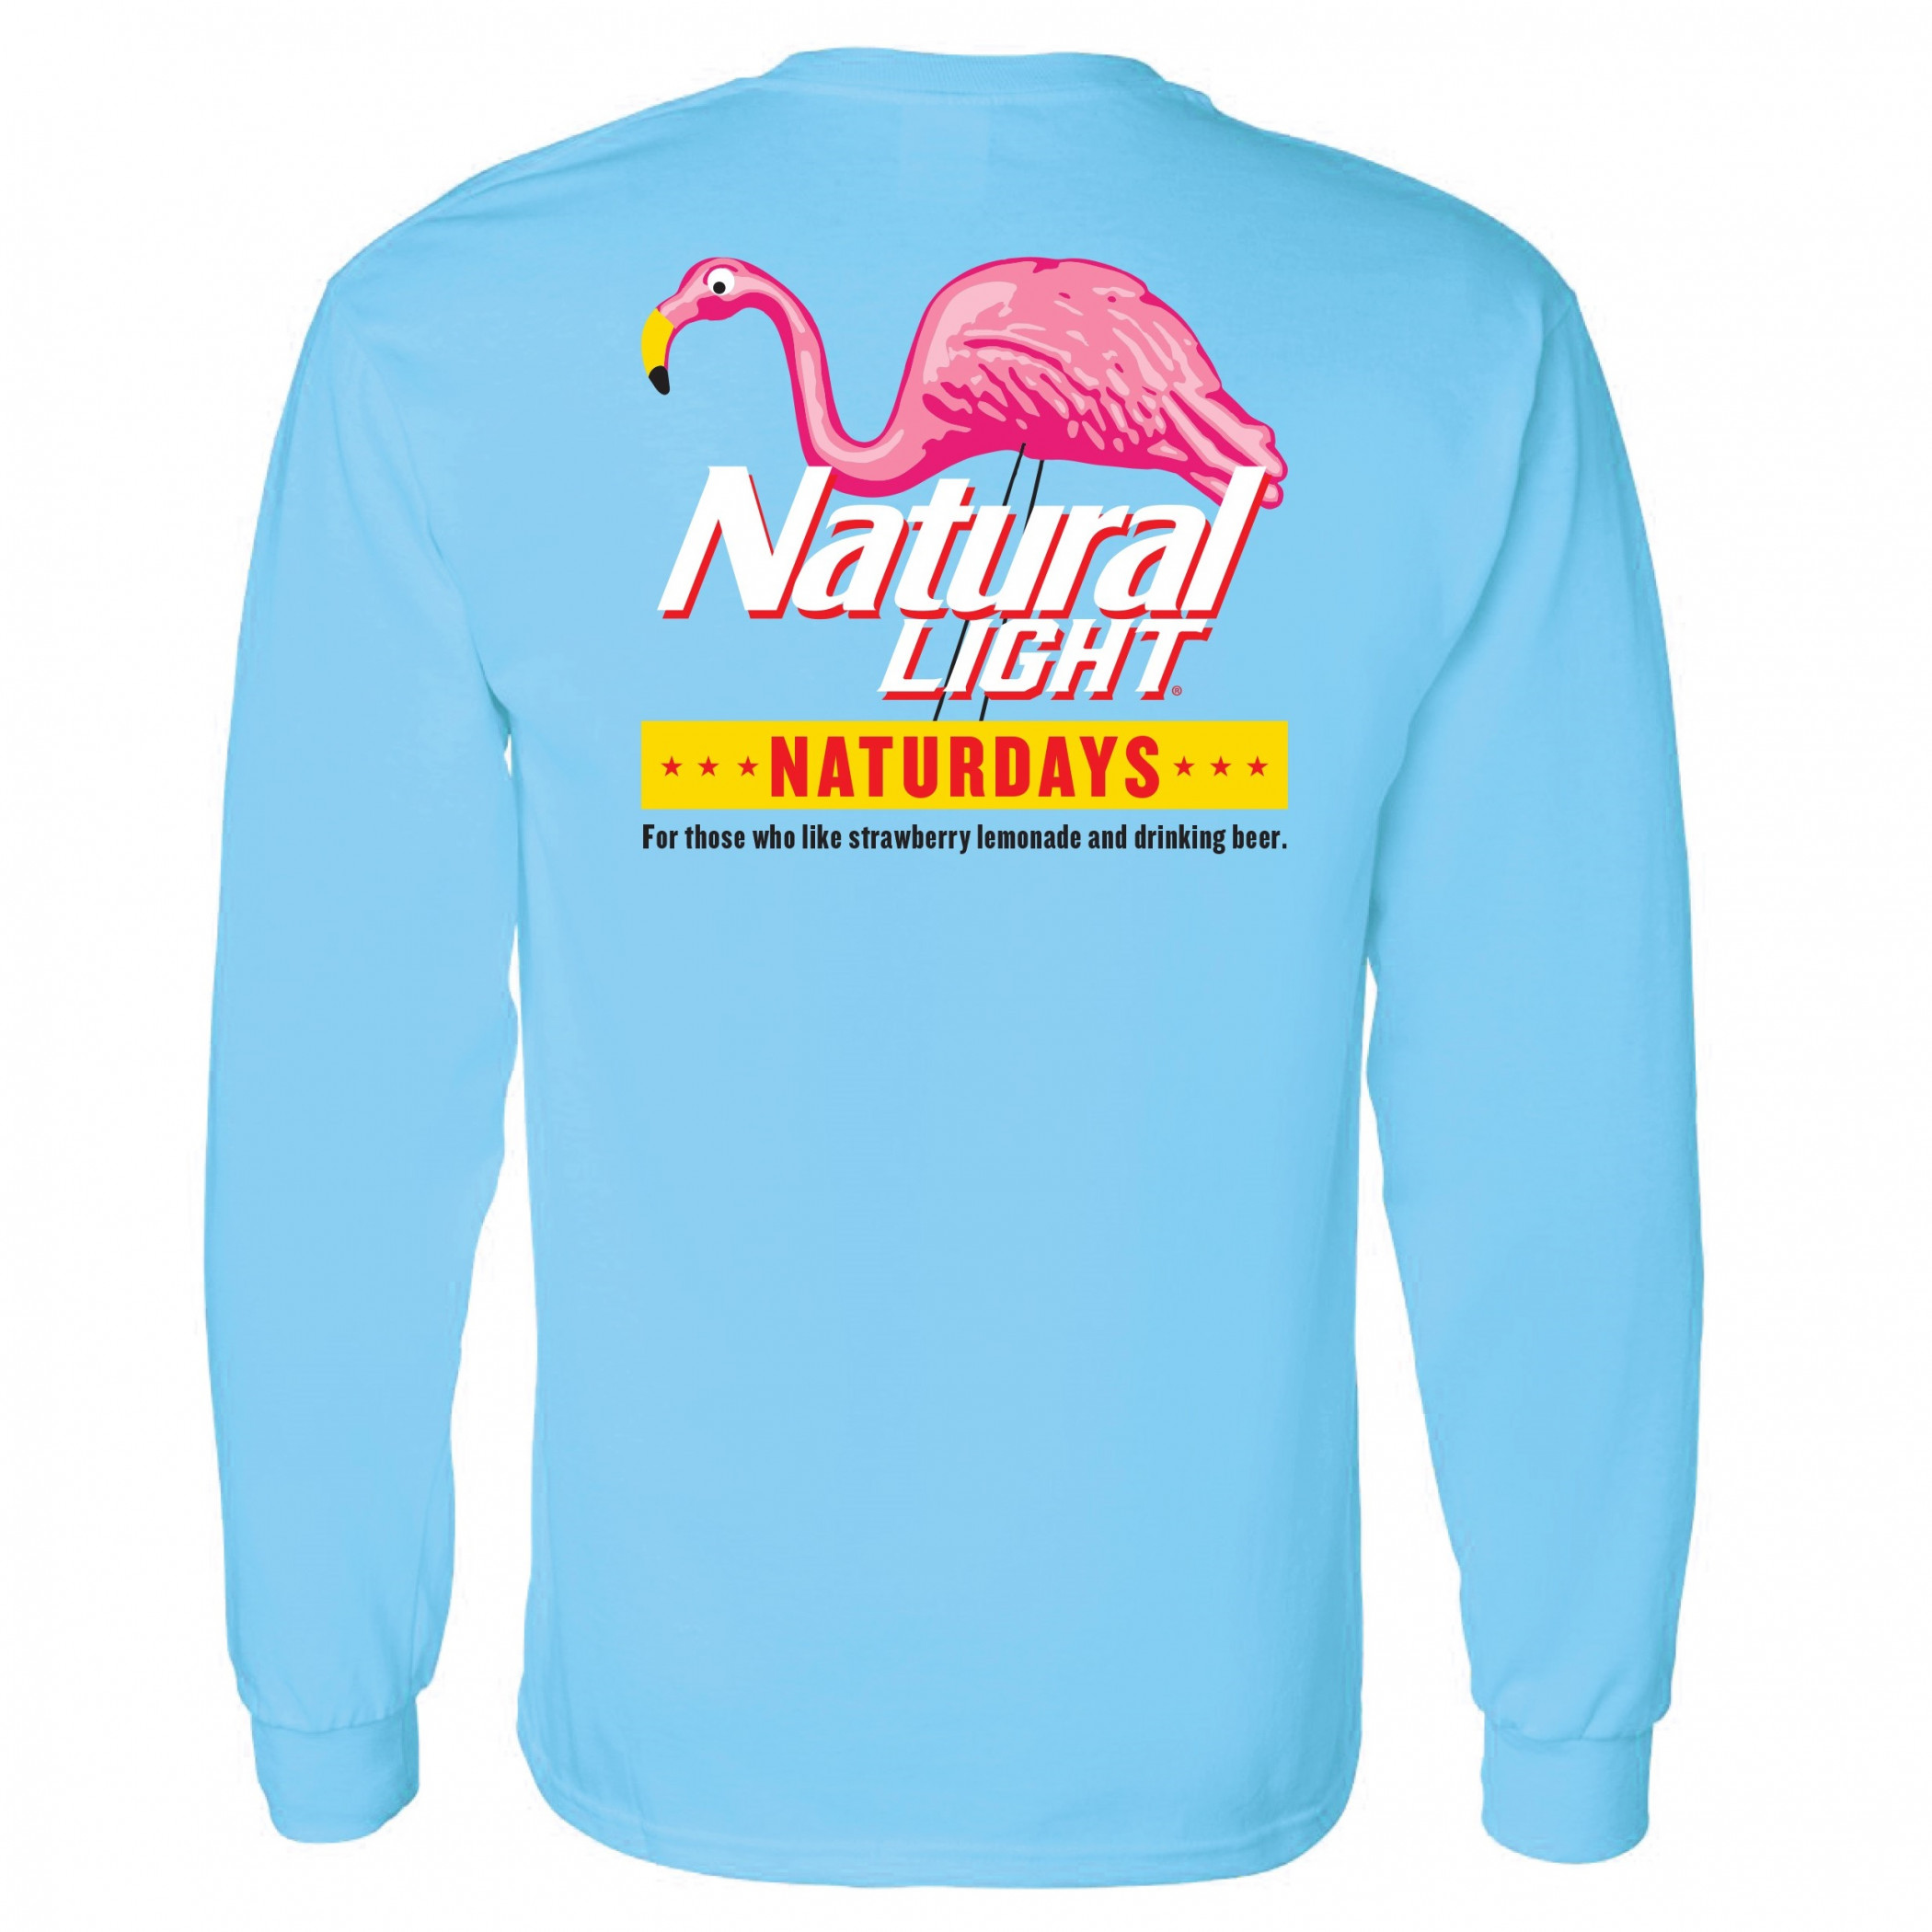 Natural Light Naturdays Flamingo Bright Blue Long Sleeve Shirt